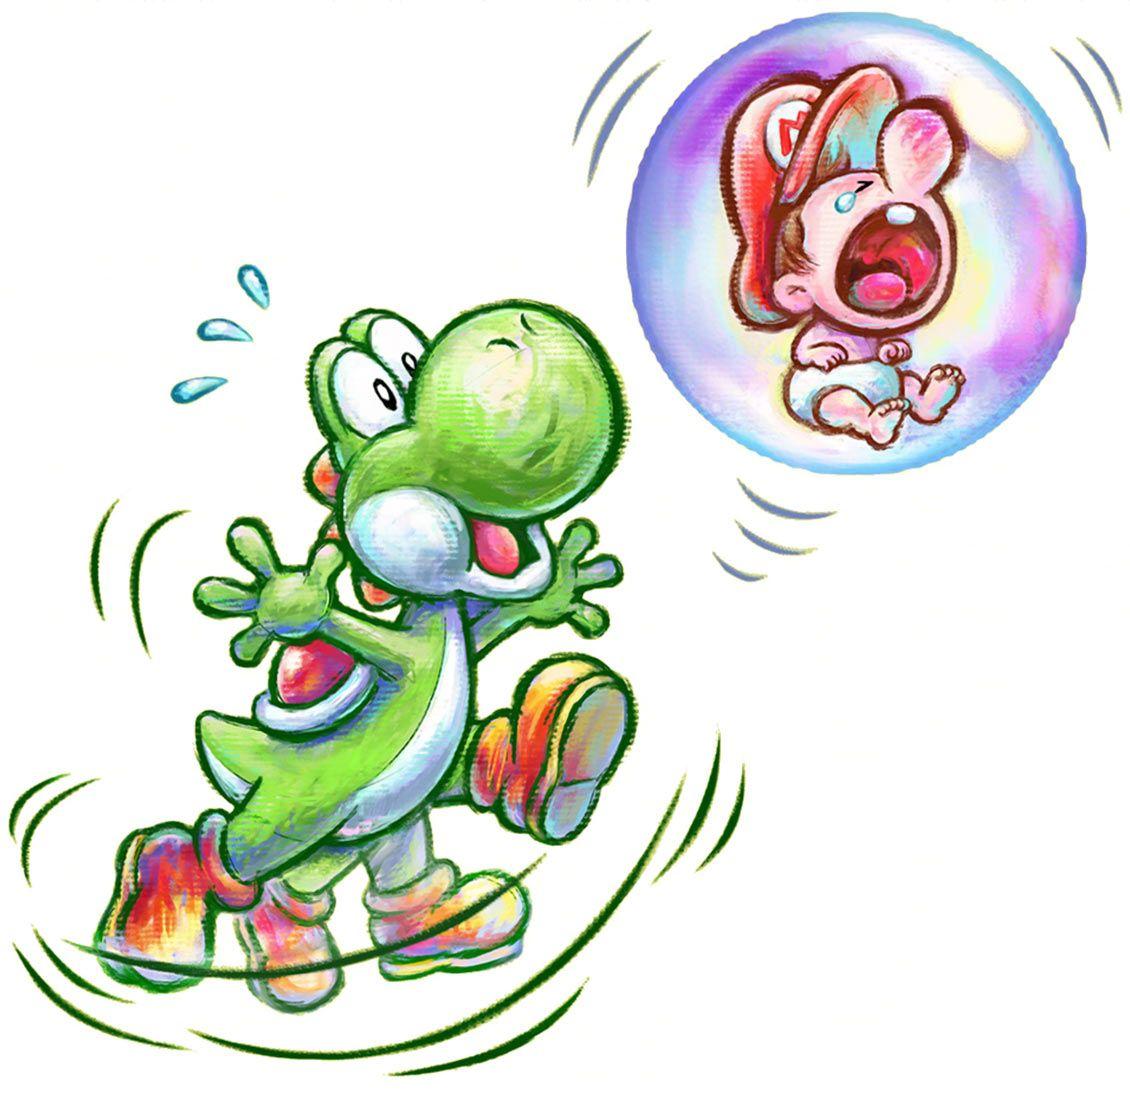 Super mario characters yoshi